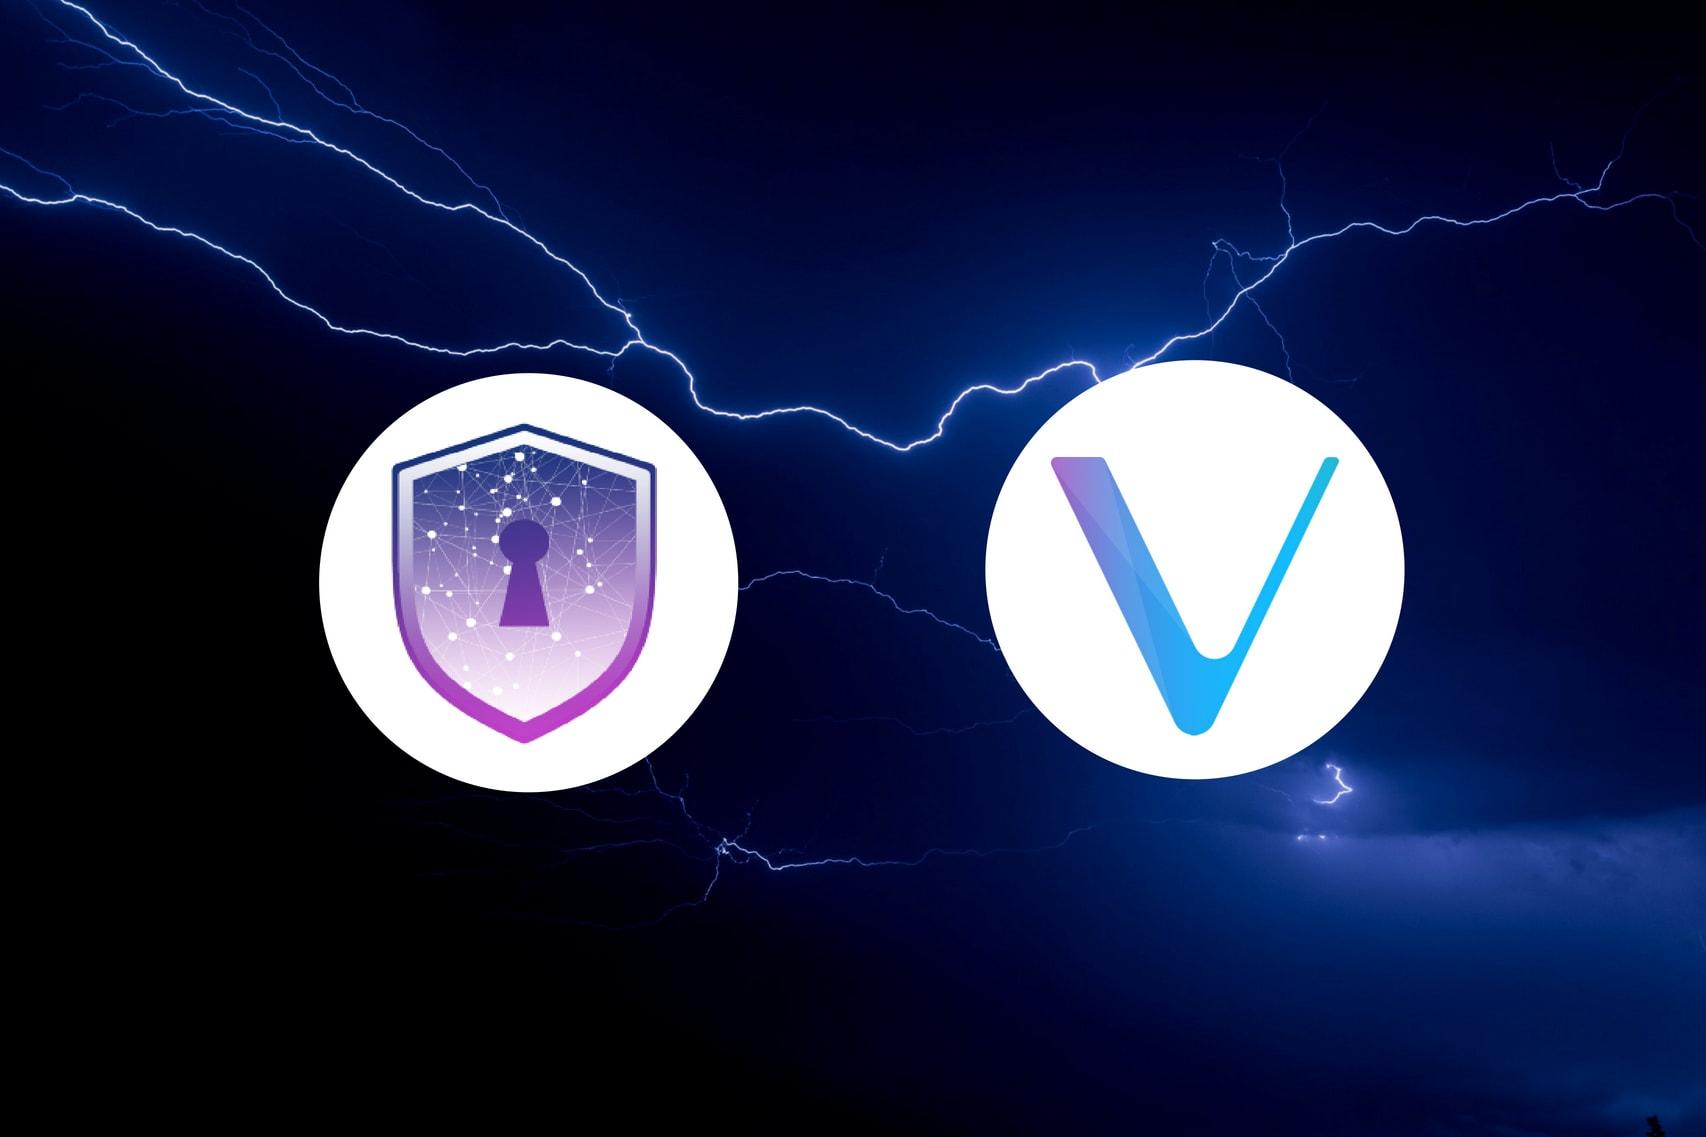 Safe Haven Joins the VeChainThor Blockchain